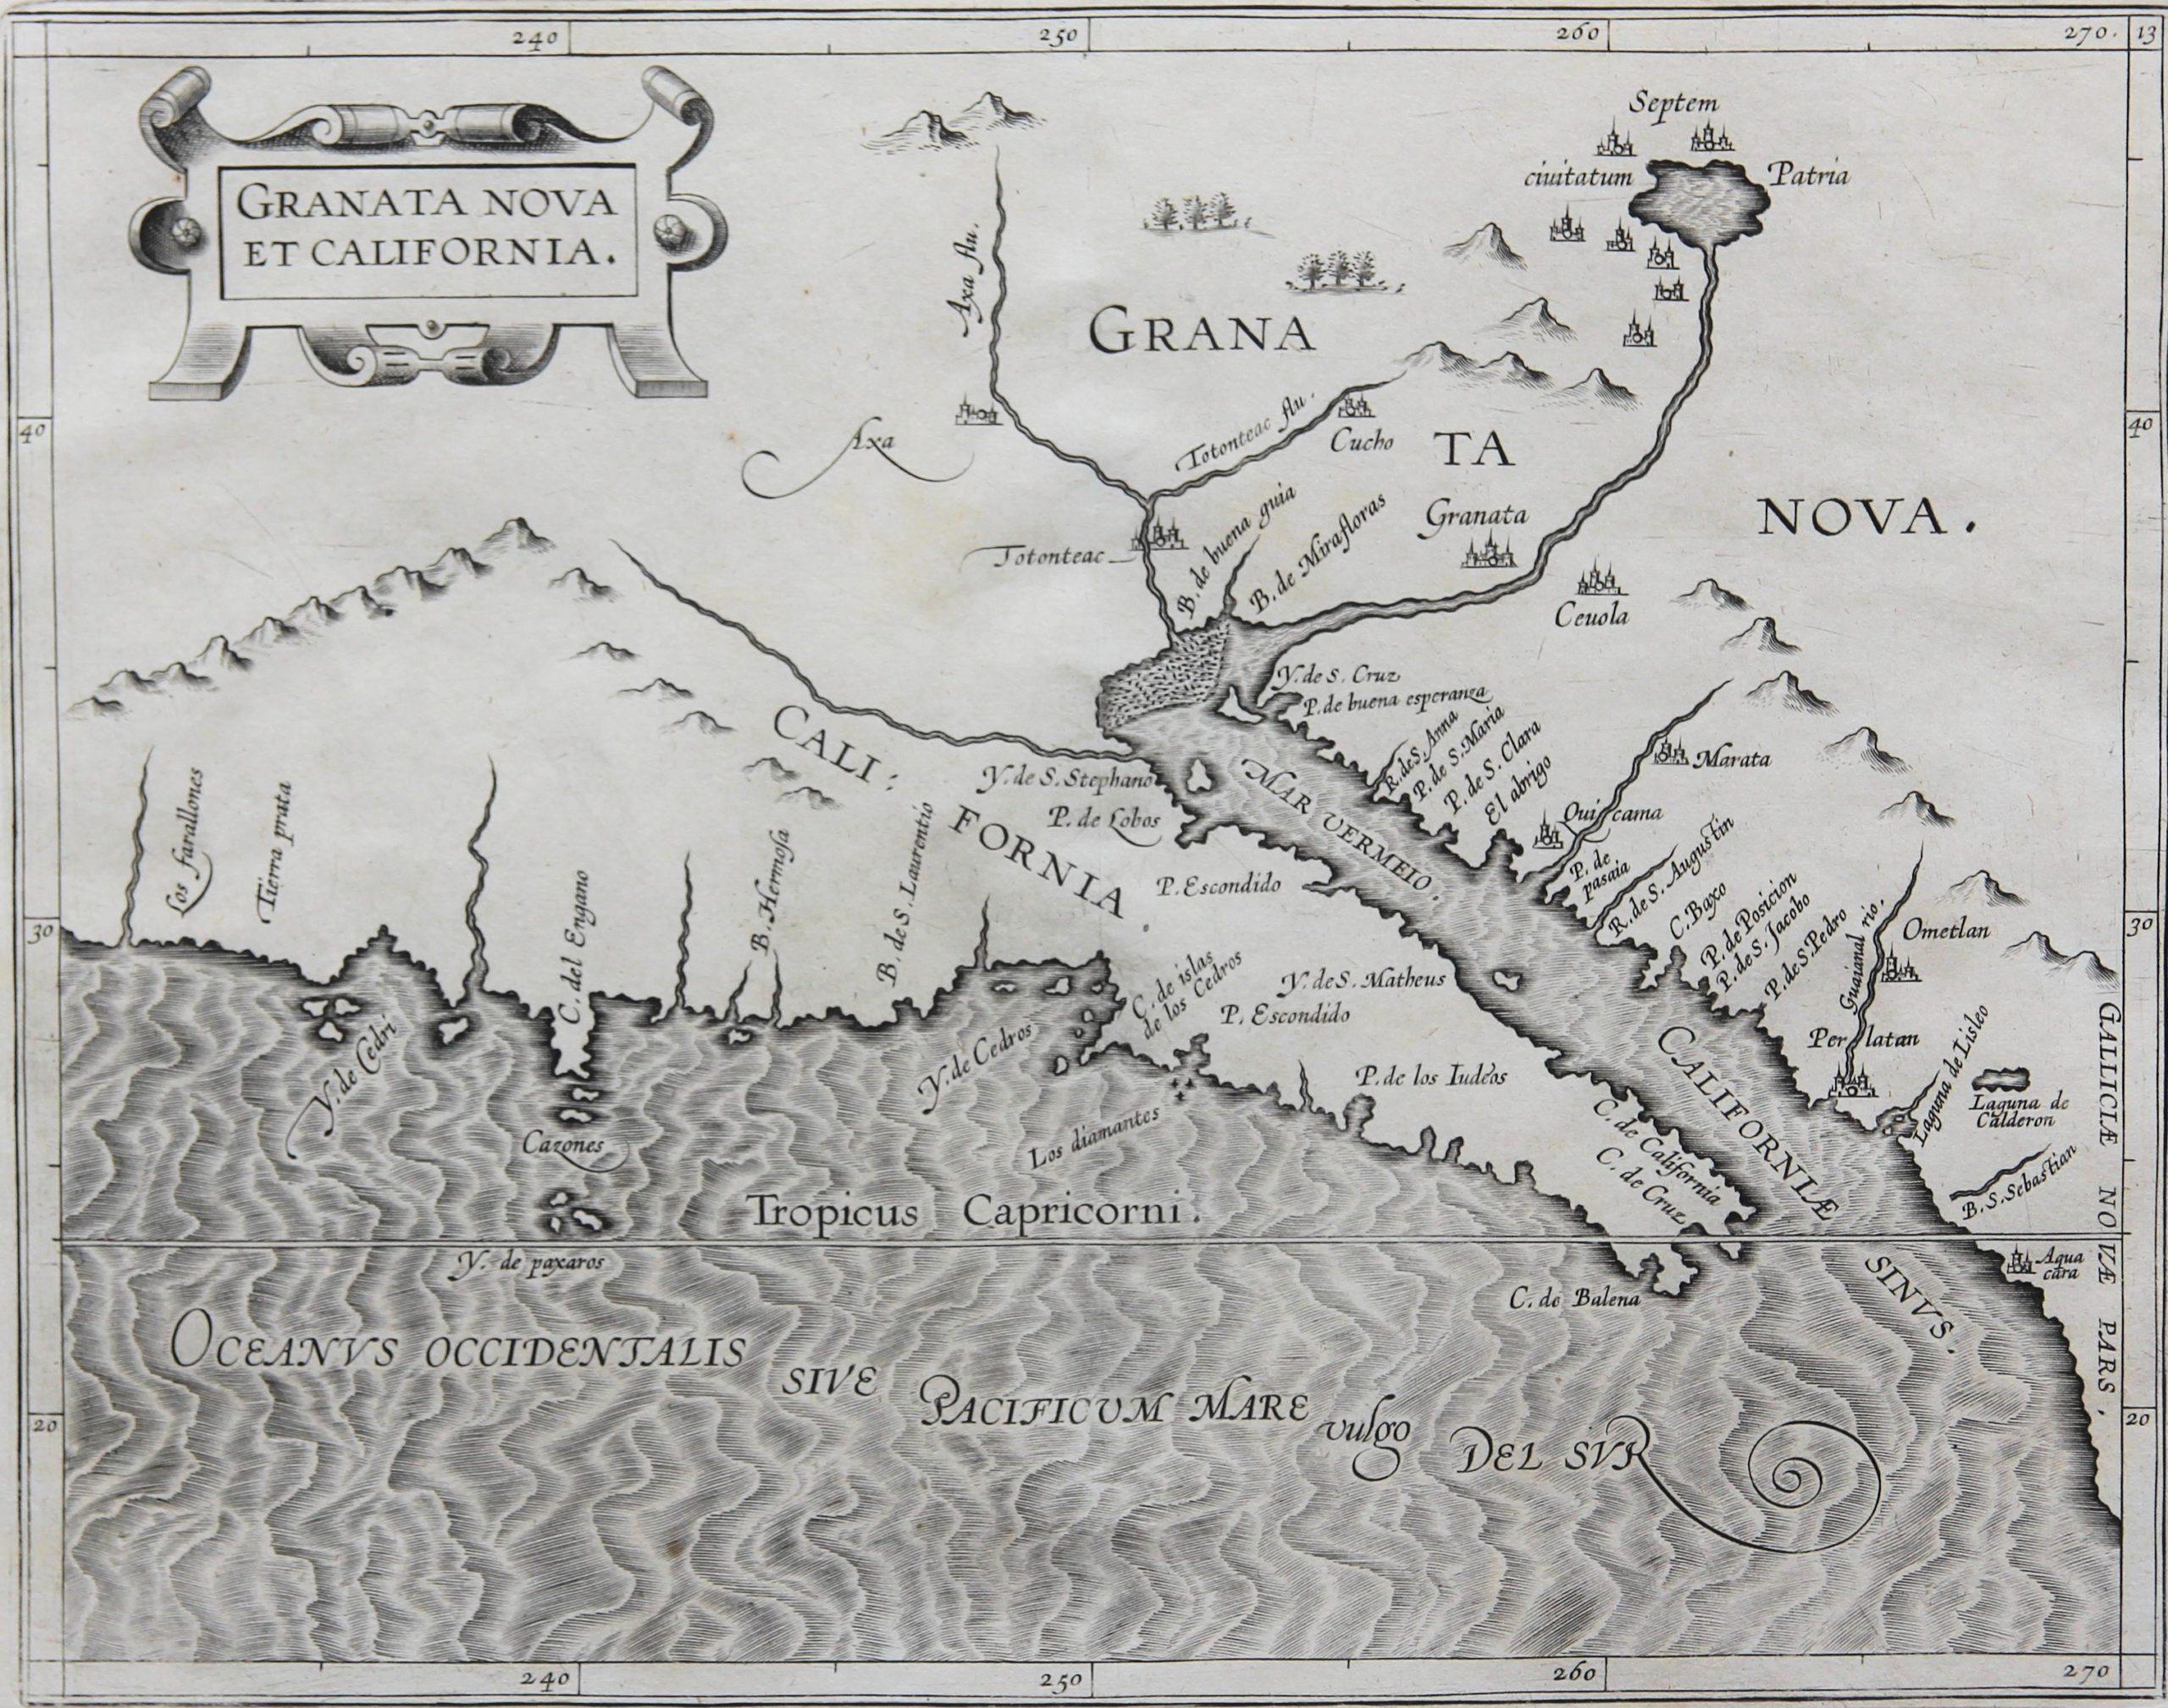 Old original map of California by Wytfliet